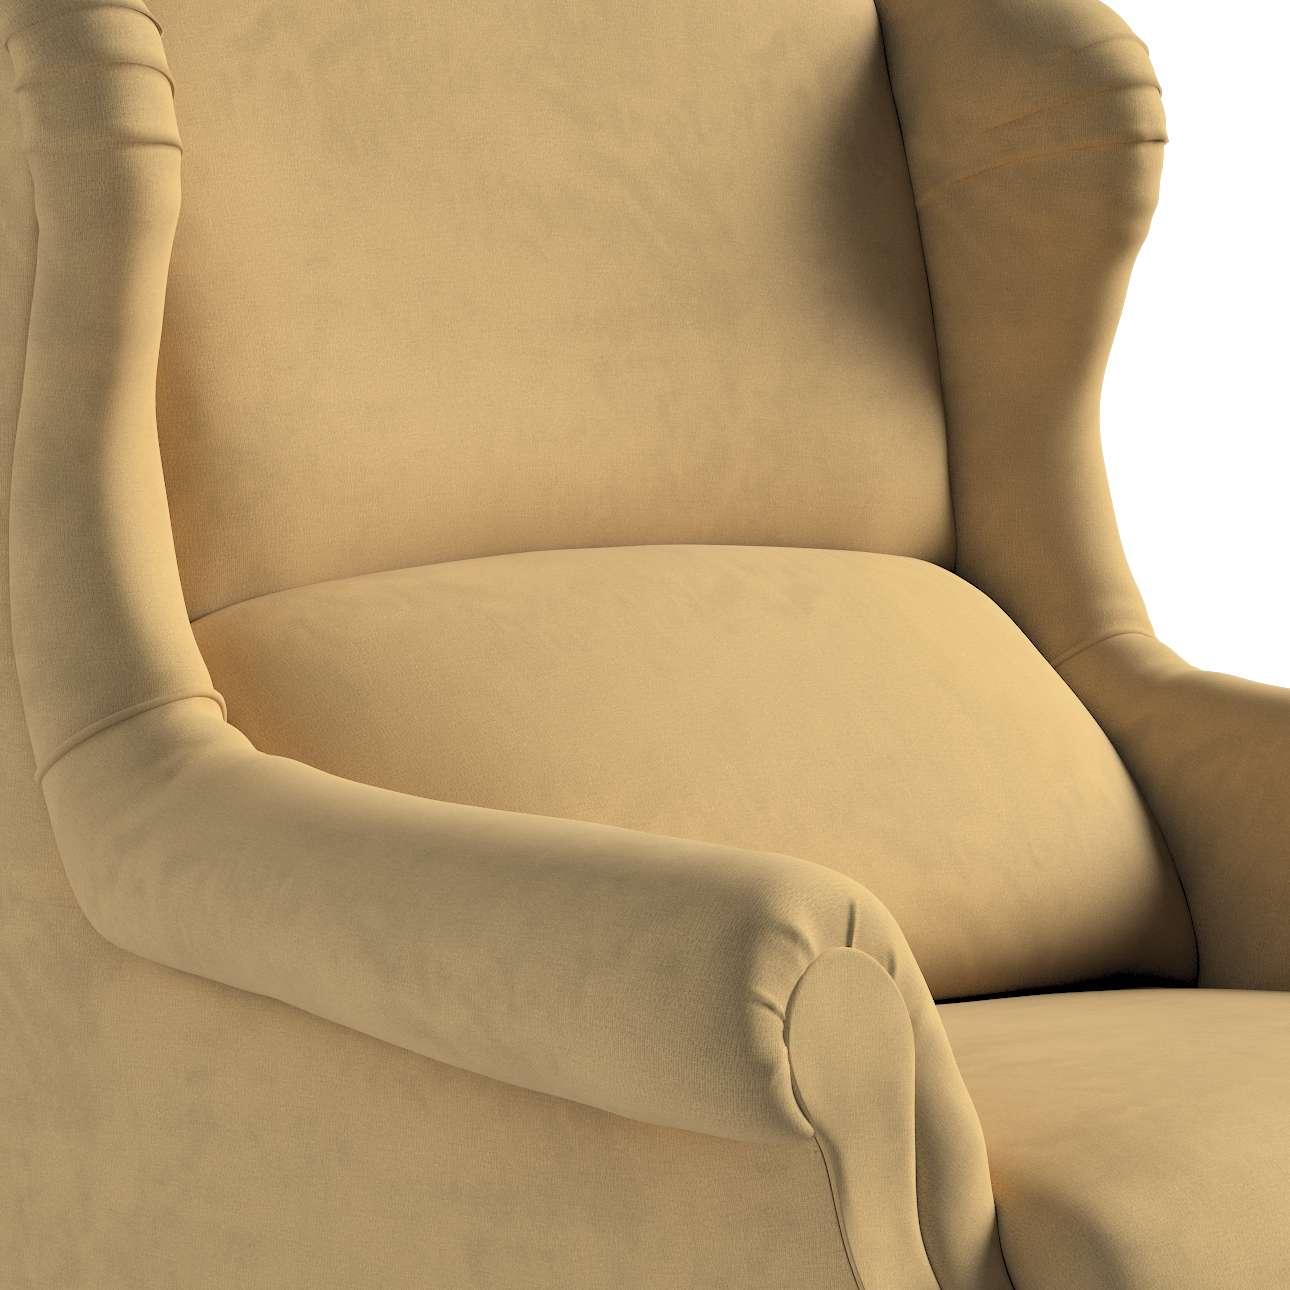 Fotel Unique w kolekcji Living, tkanina: 160-93